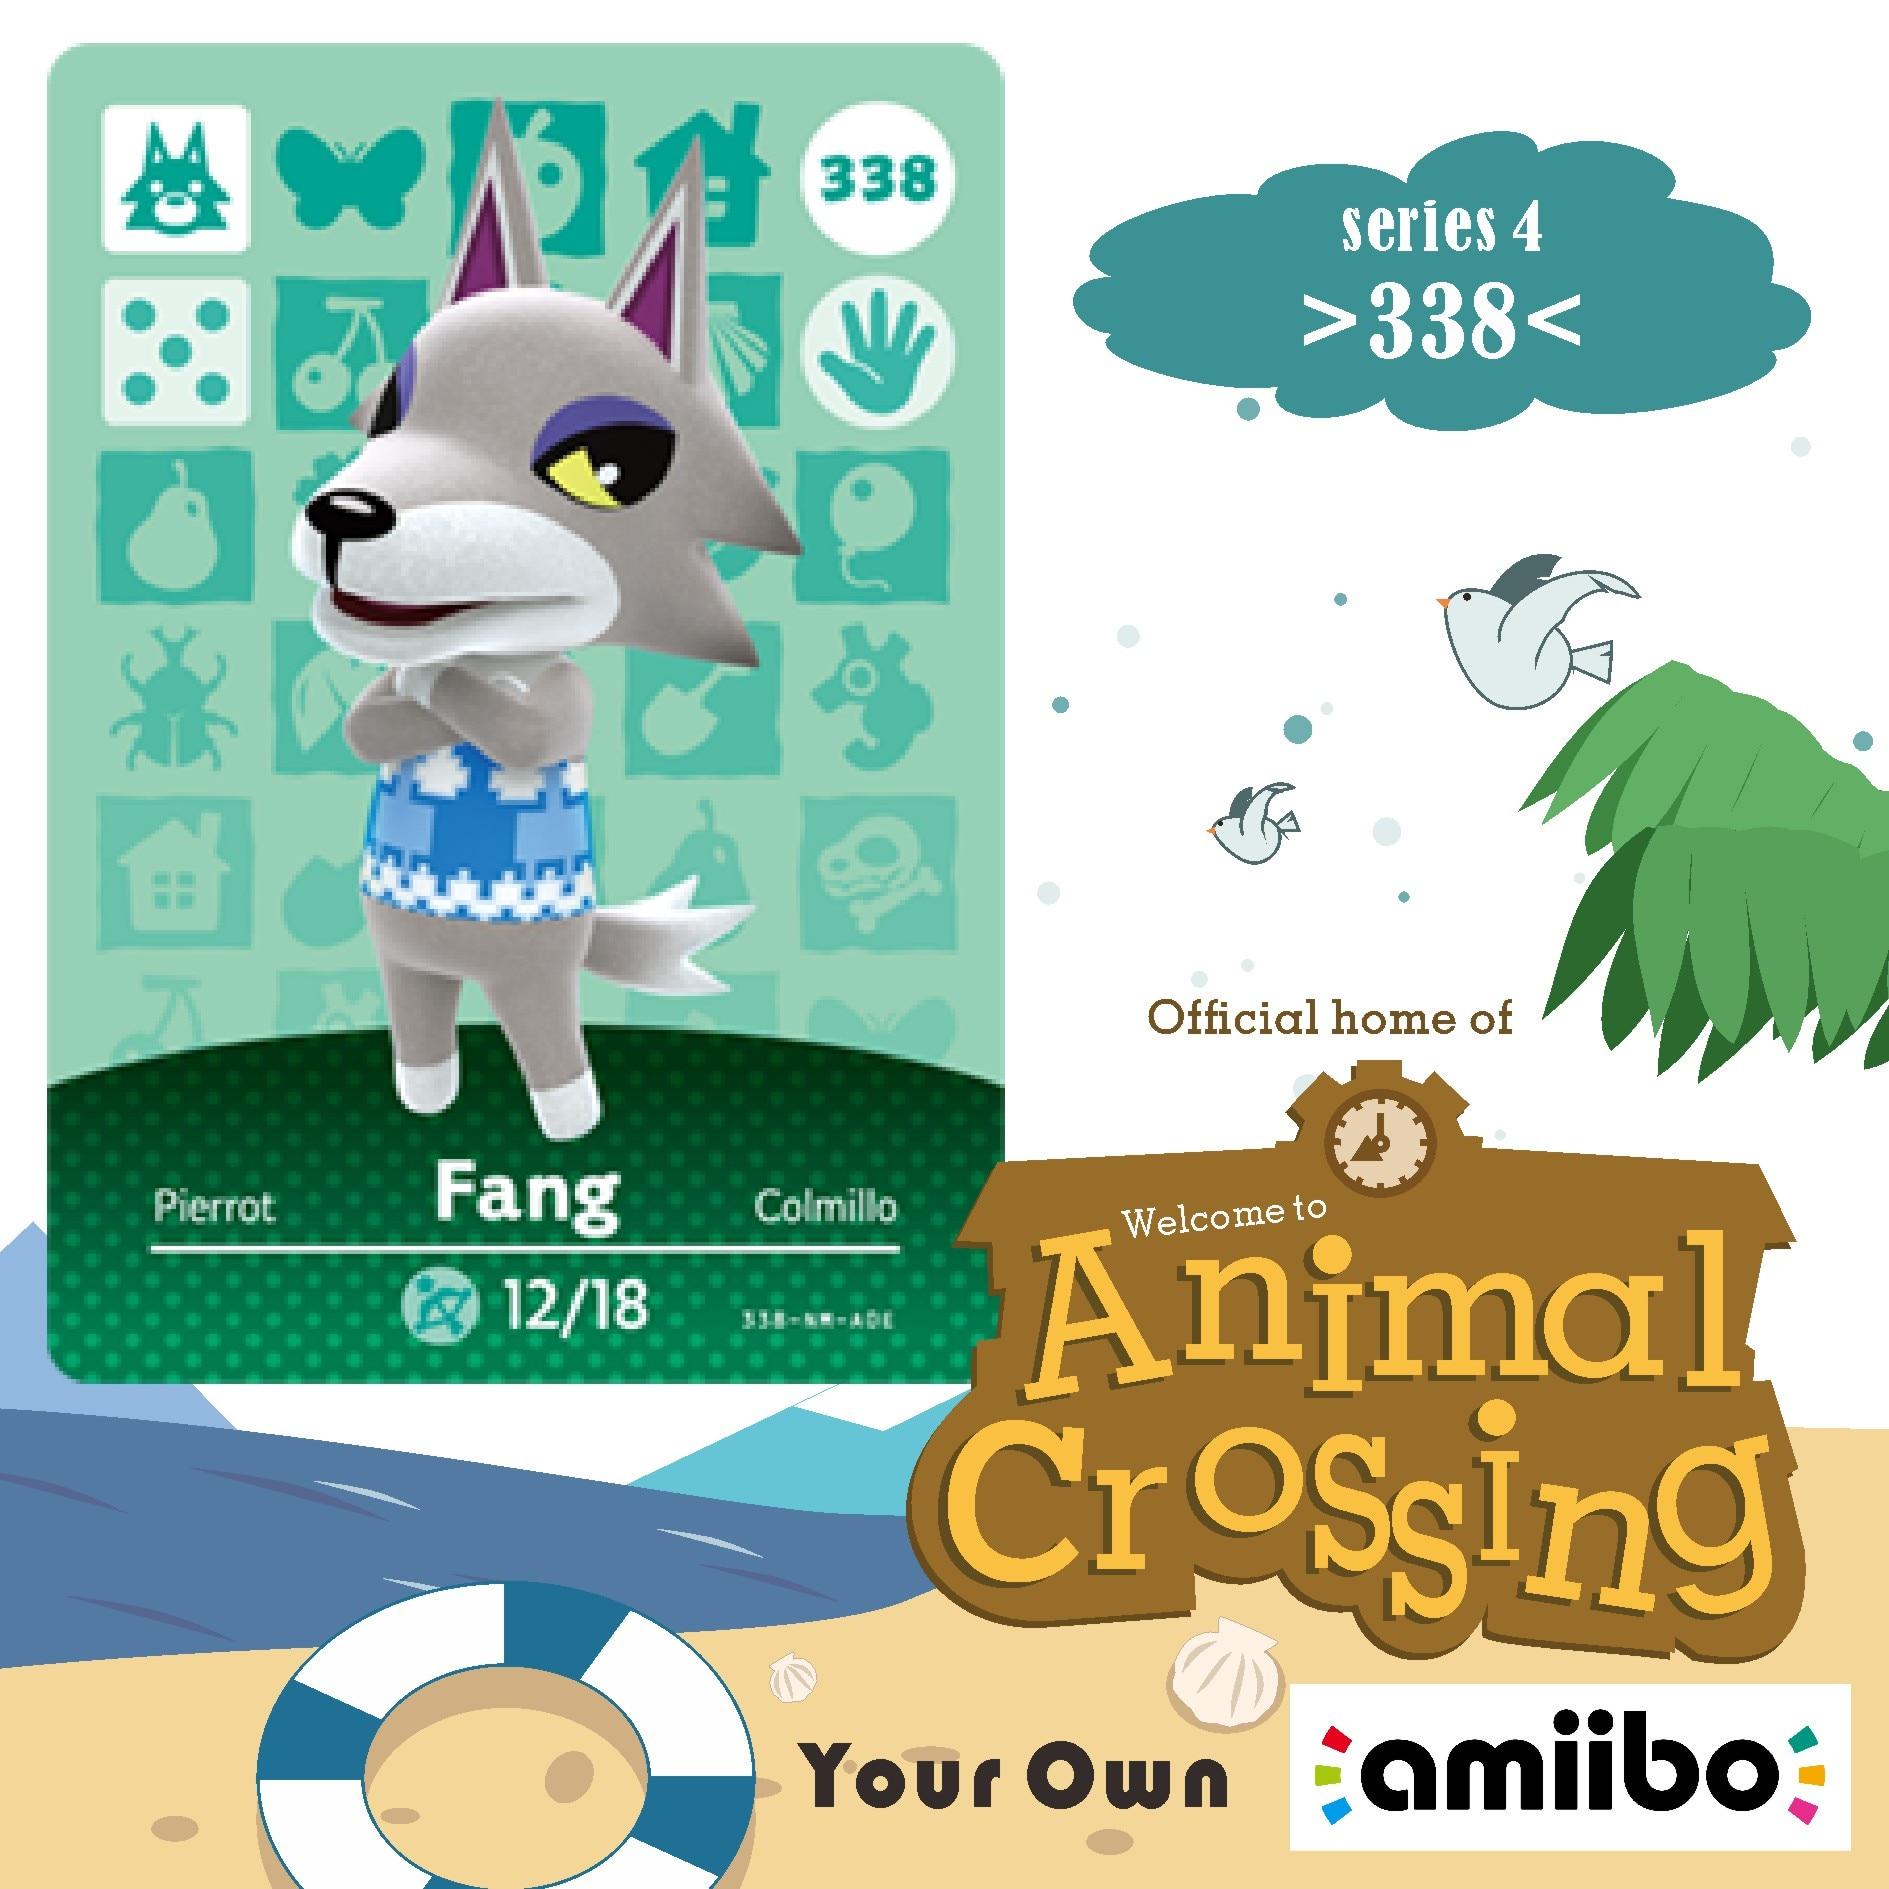 338 Animal Crossing Fang Amiibo Card Fang Crossing Switch Rv Welcome Amiibo Villager New Horizons Amiibo Card Gift Cross Cards 1